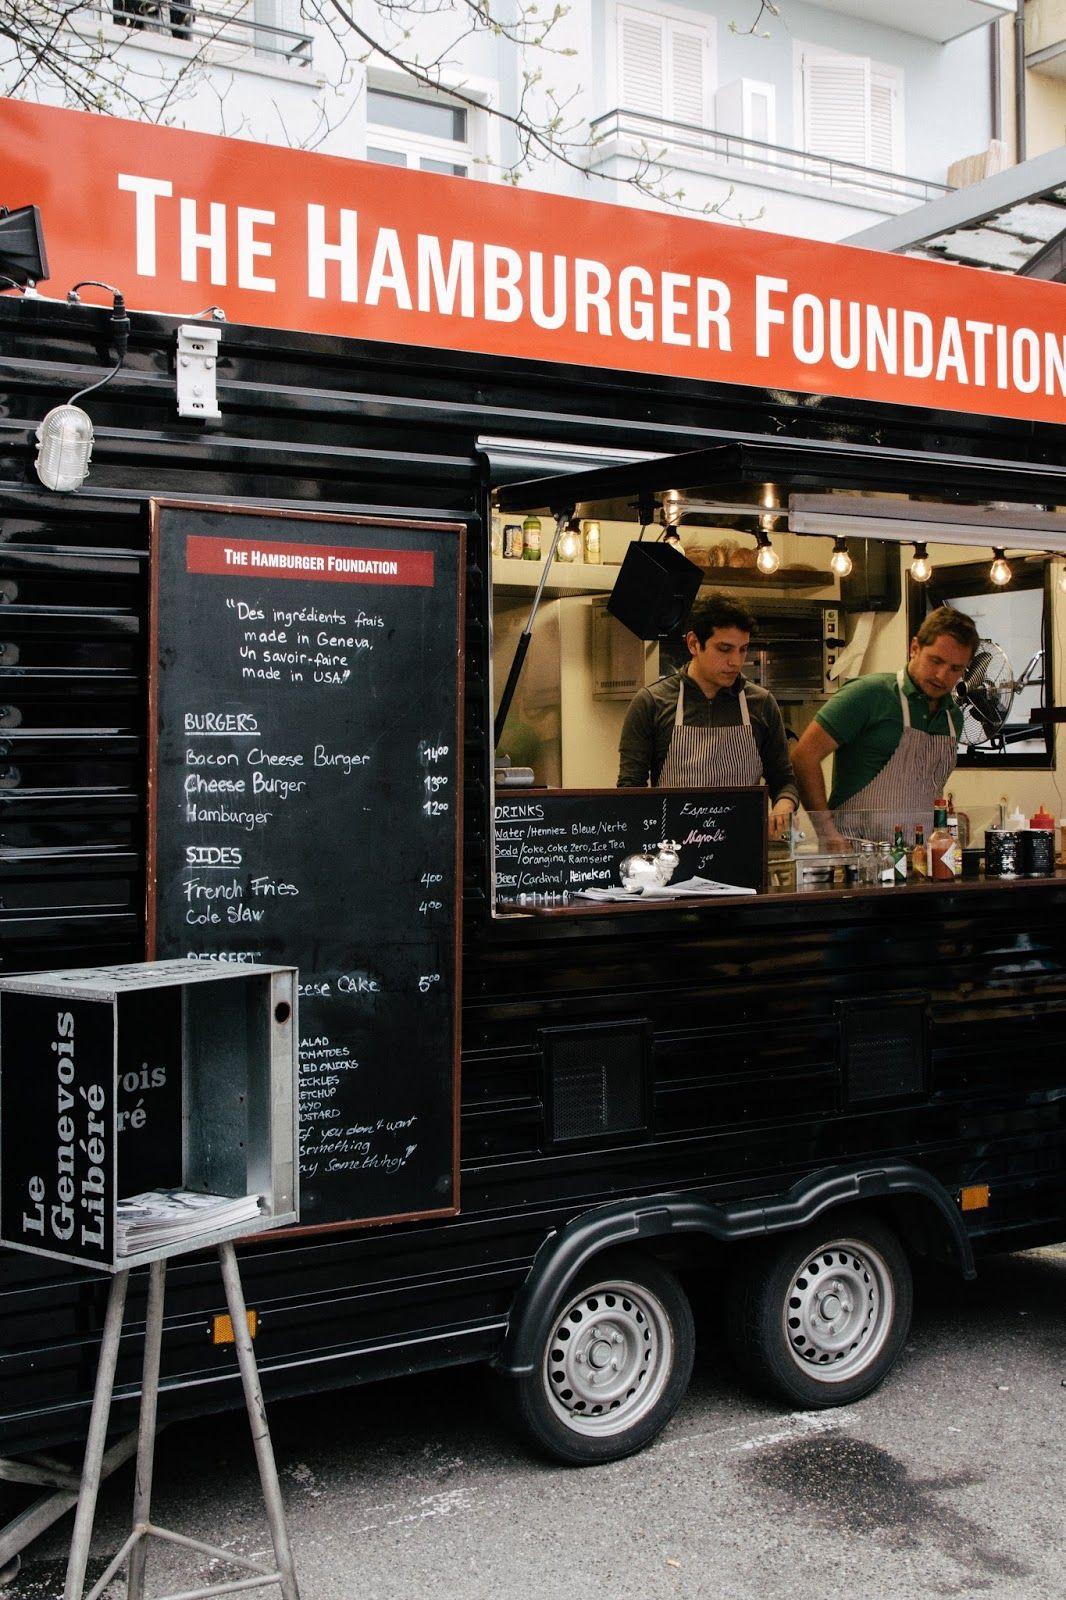 the hamburger foundation 70percentpure geneva mobile. Black Bedroom Furniture Sets. Home Design Ideas